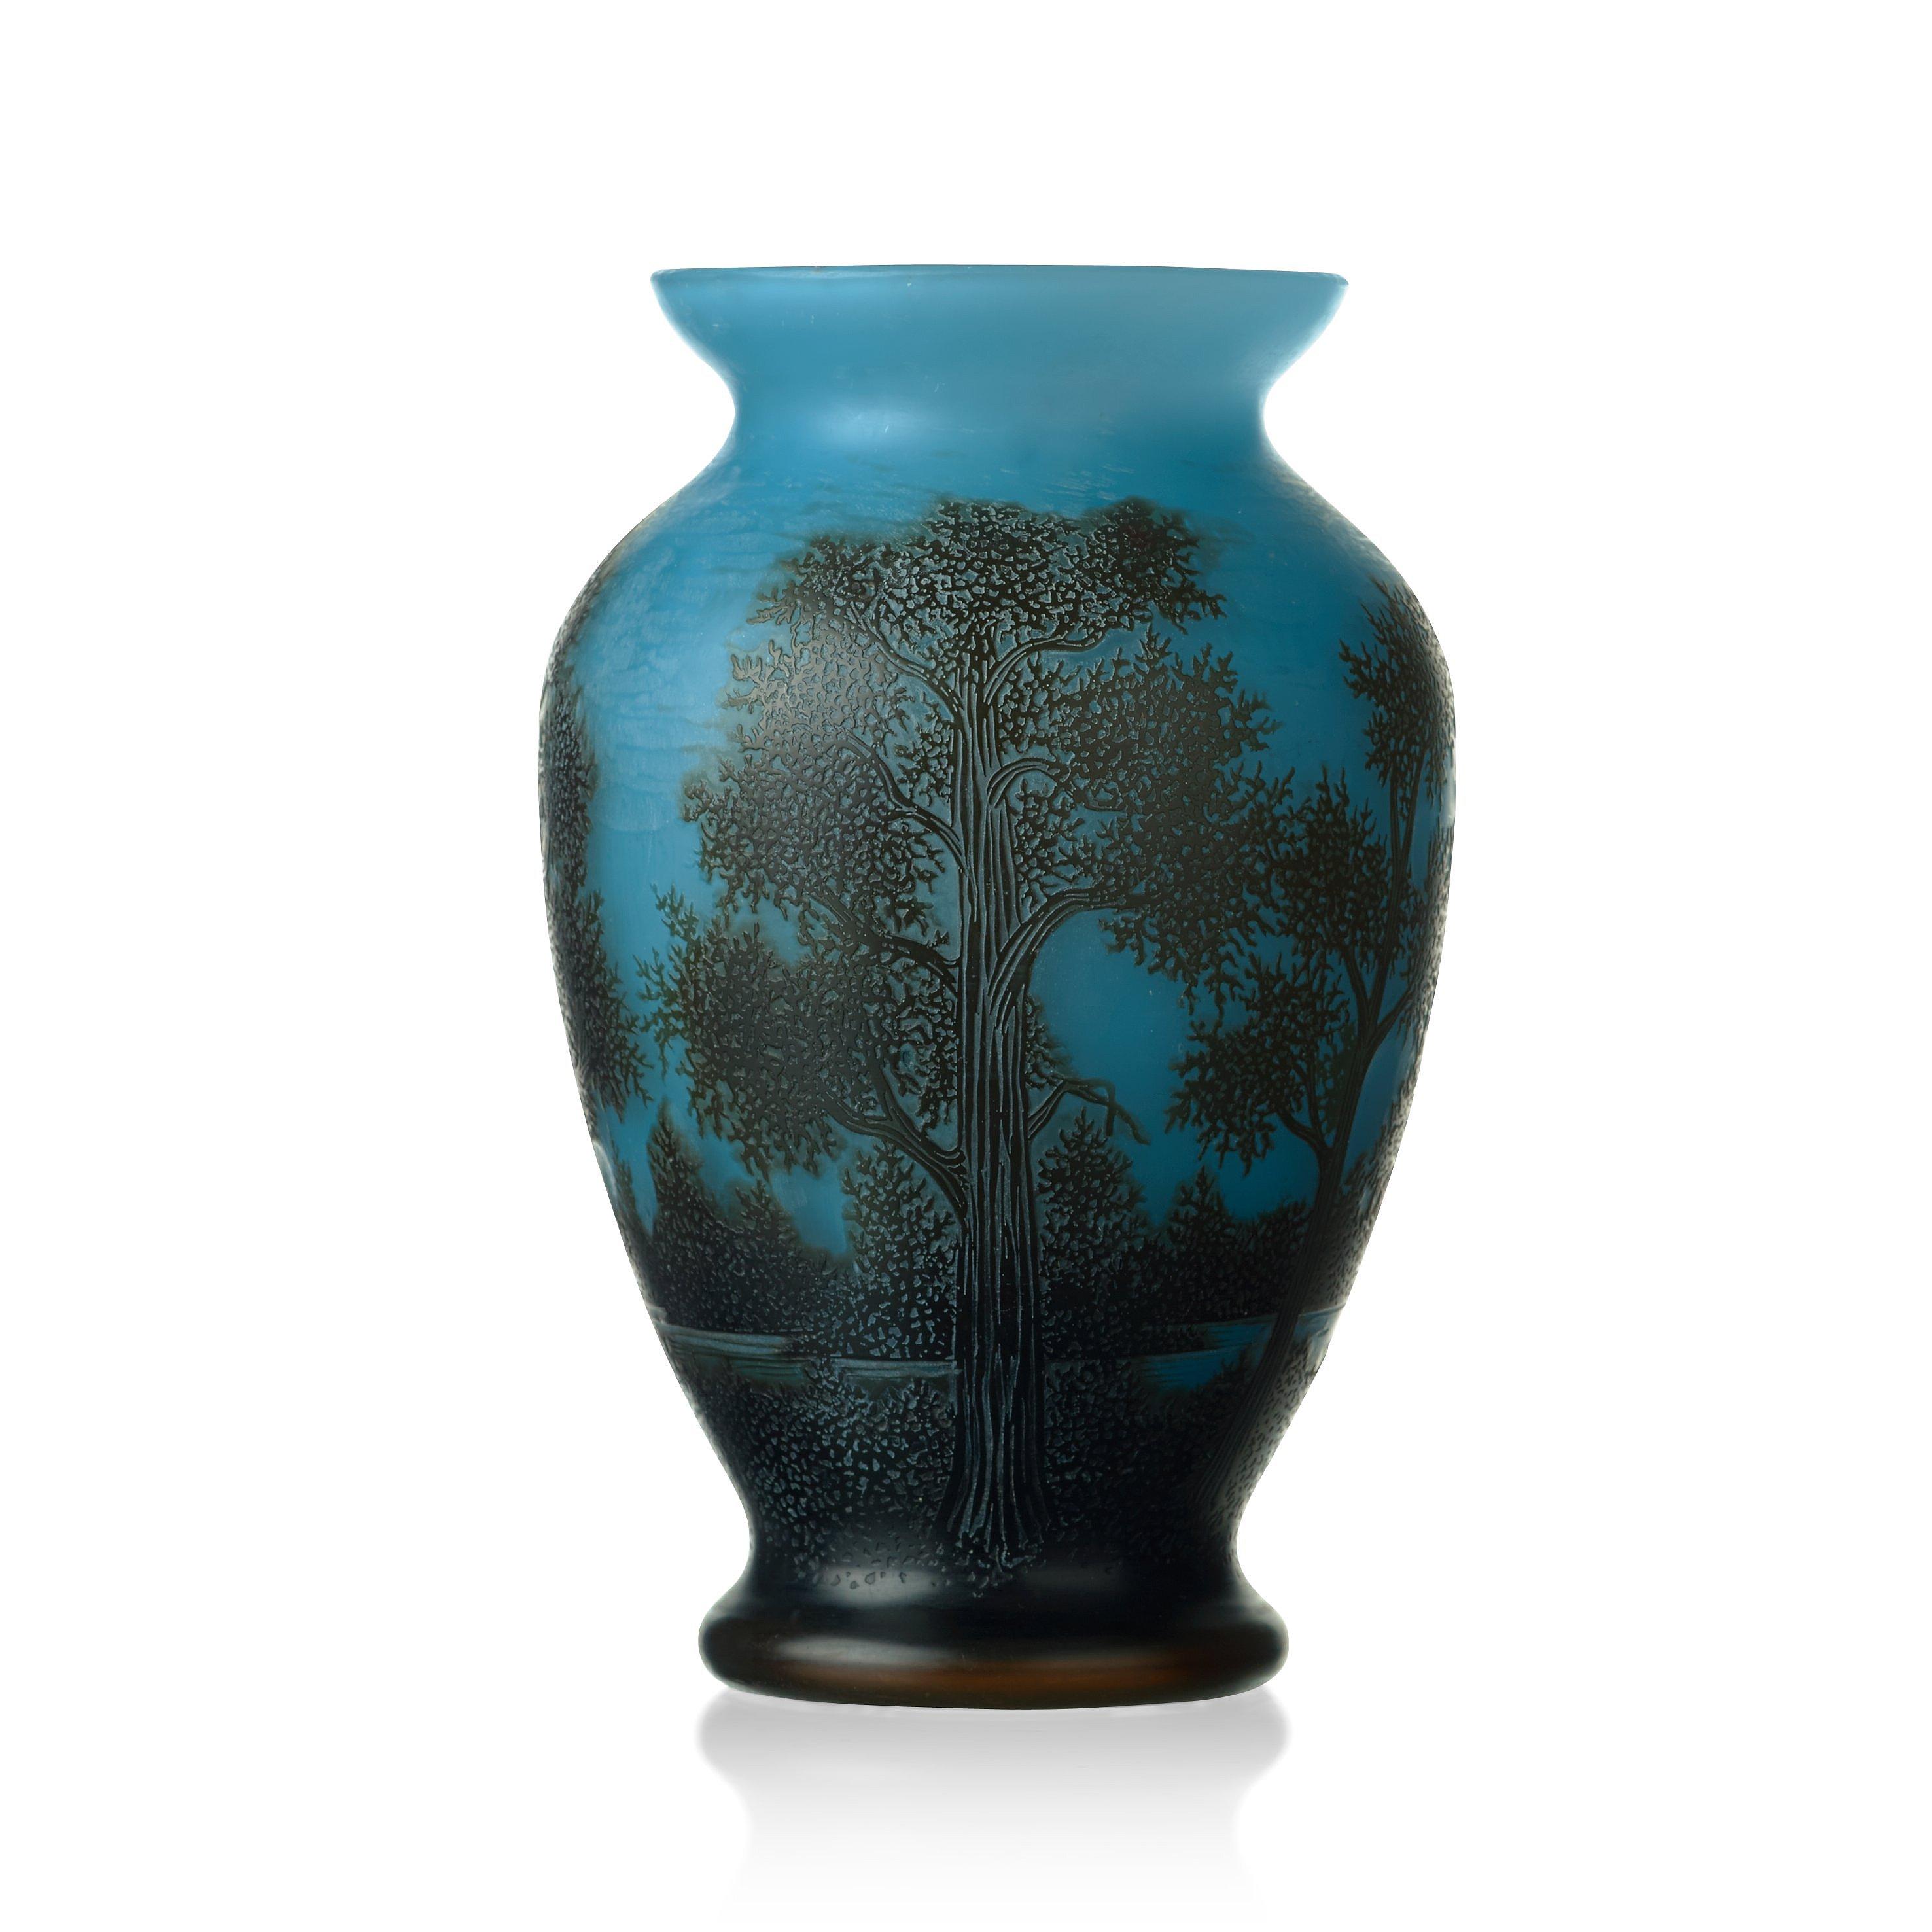 AXEL ENOCH BOMAN An Art Nouveau Cameo Glass Vase Reijmyre 1917